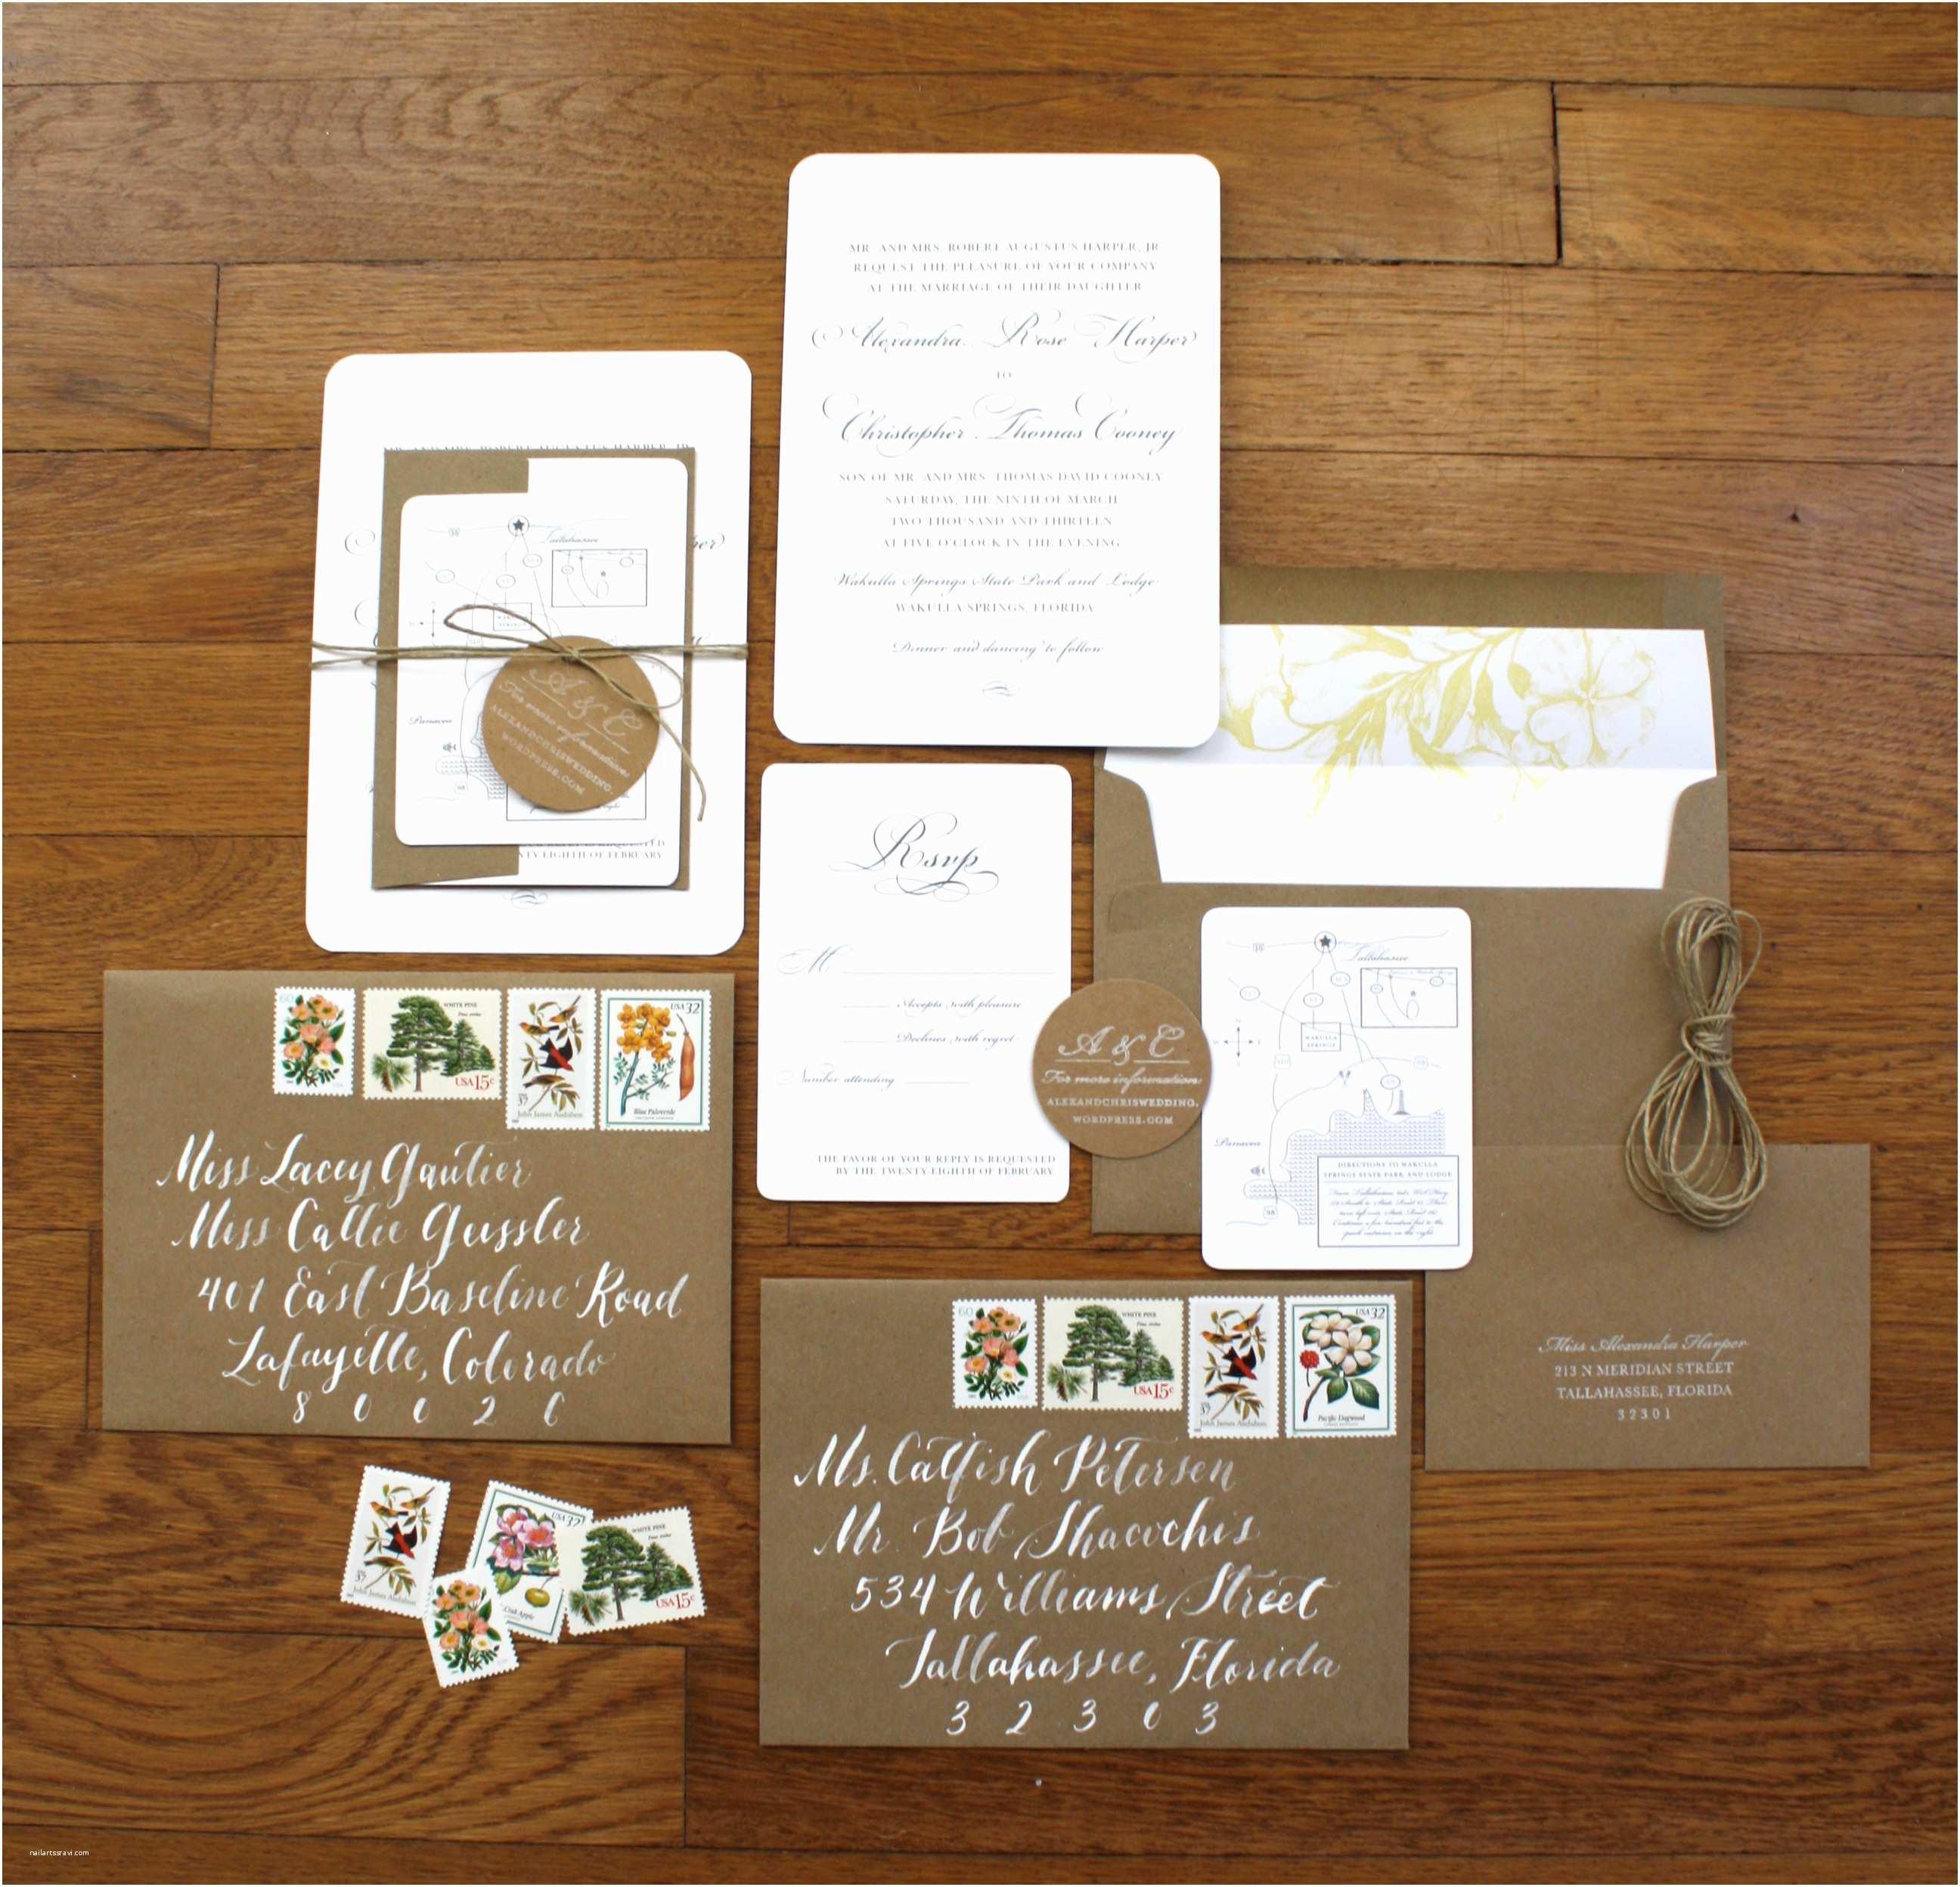 Wedding Invitation Suite the Best Wedding Invitation Suite